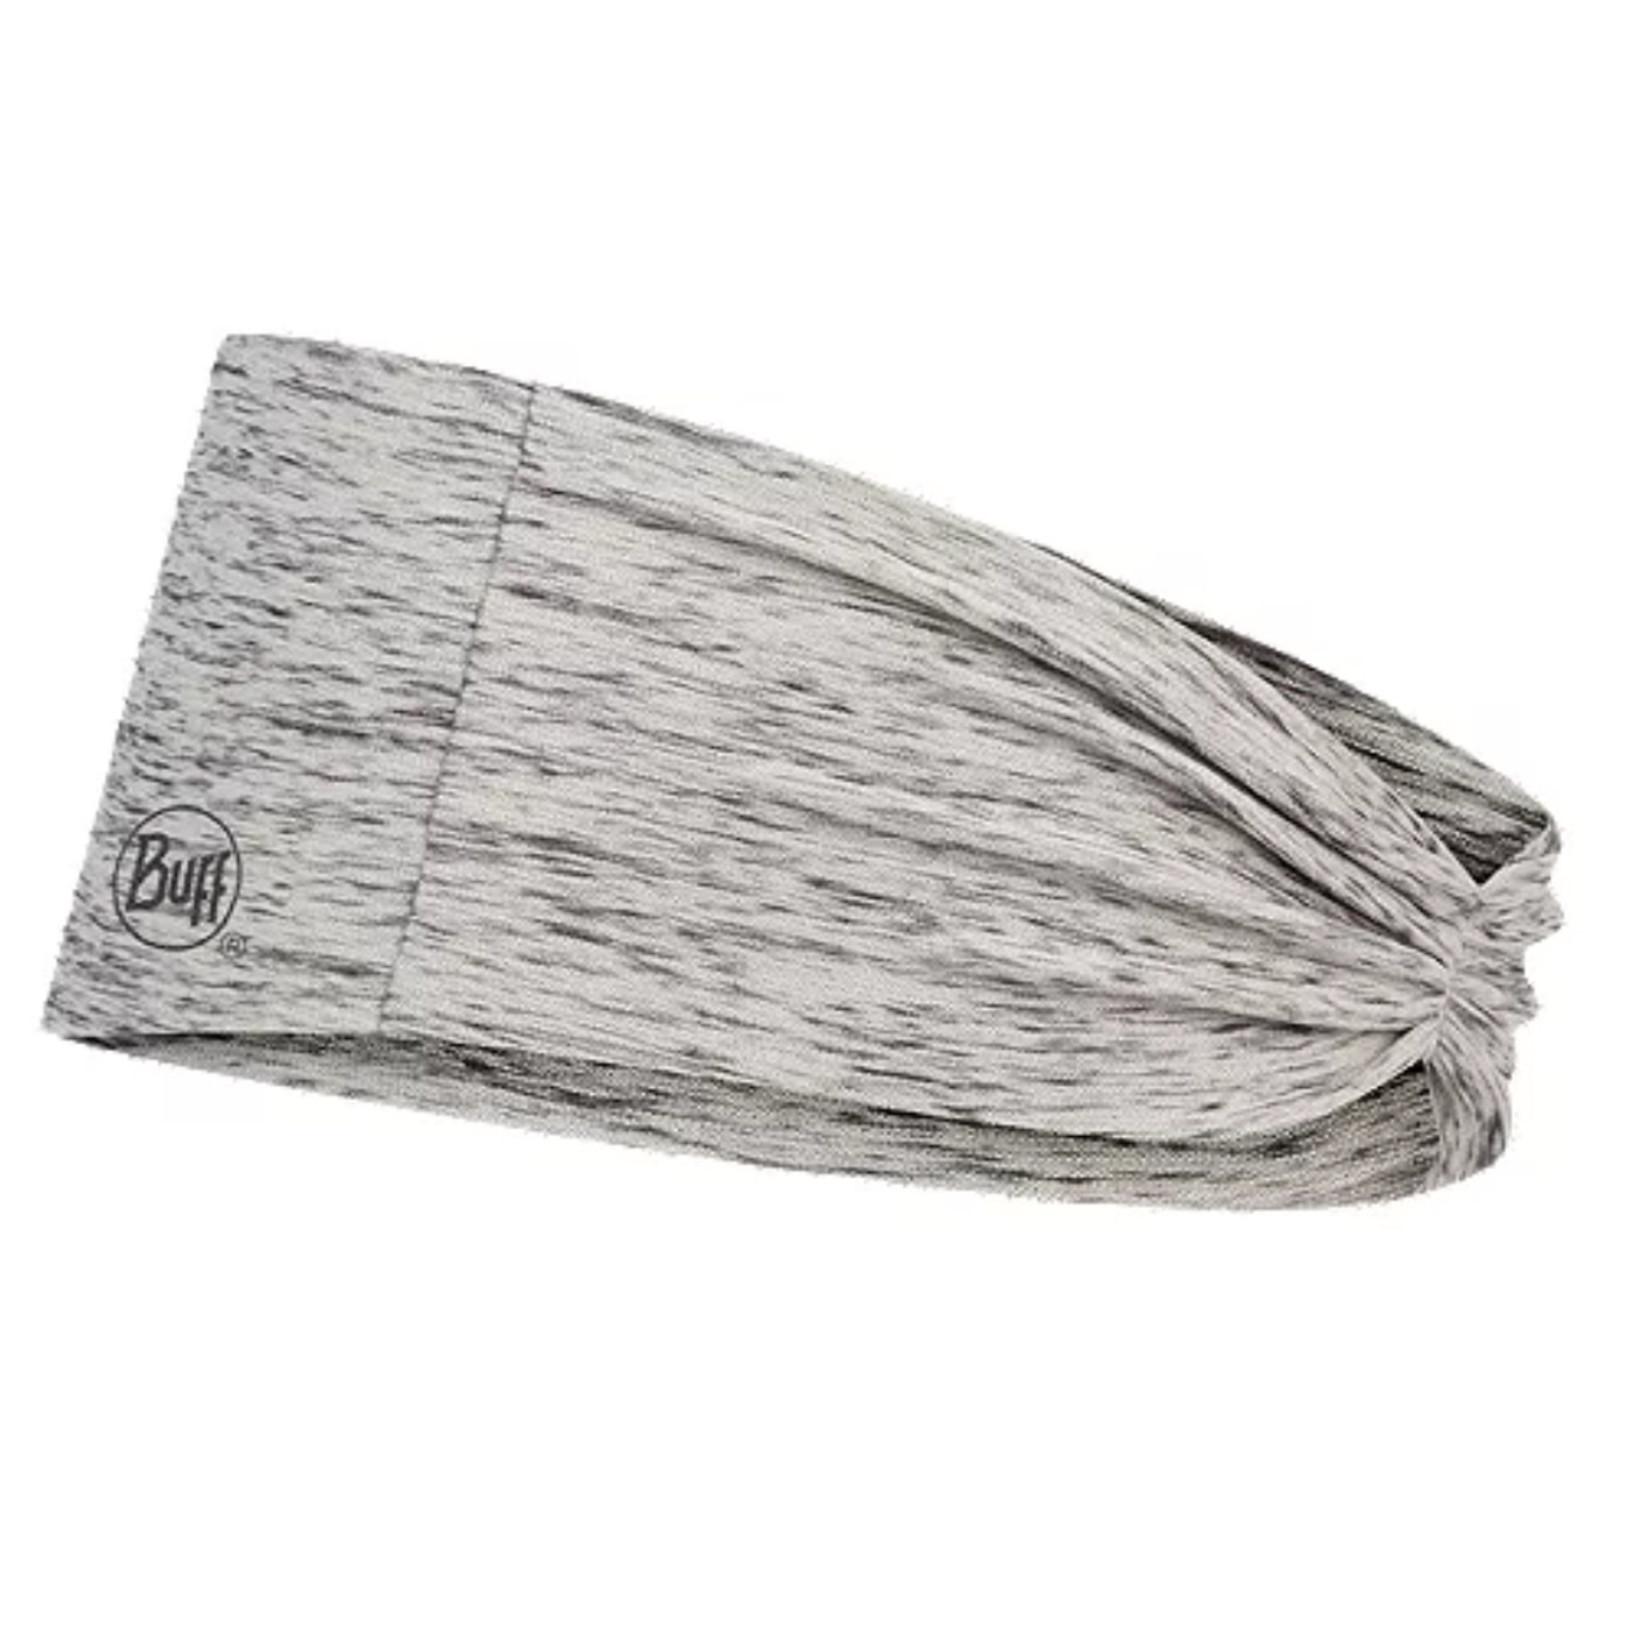 Buff Buff CoolNet UV+ Tapered Silver Grey Headband 122725.334